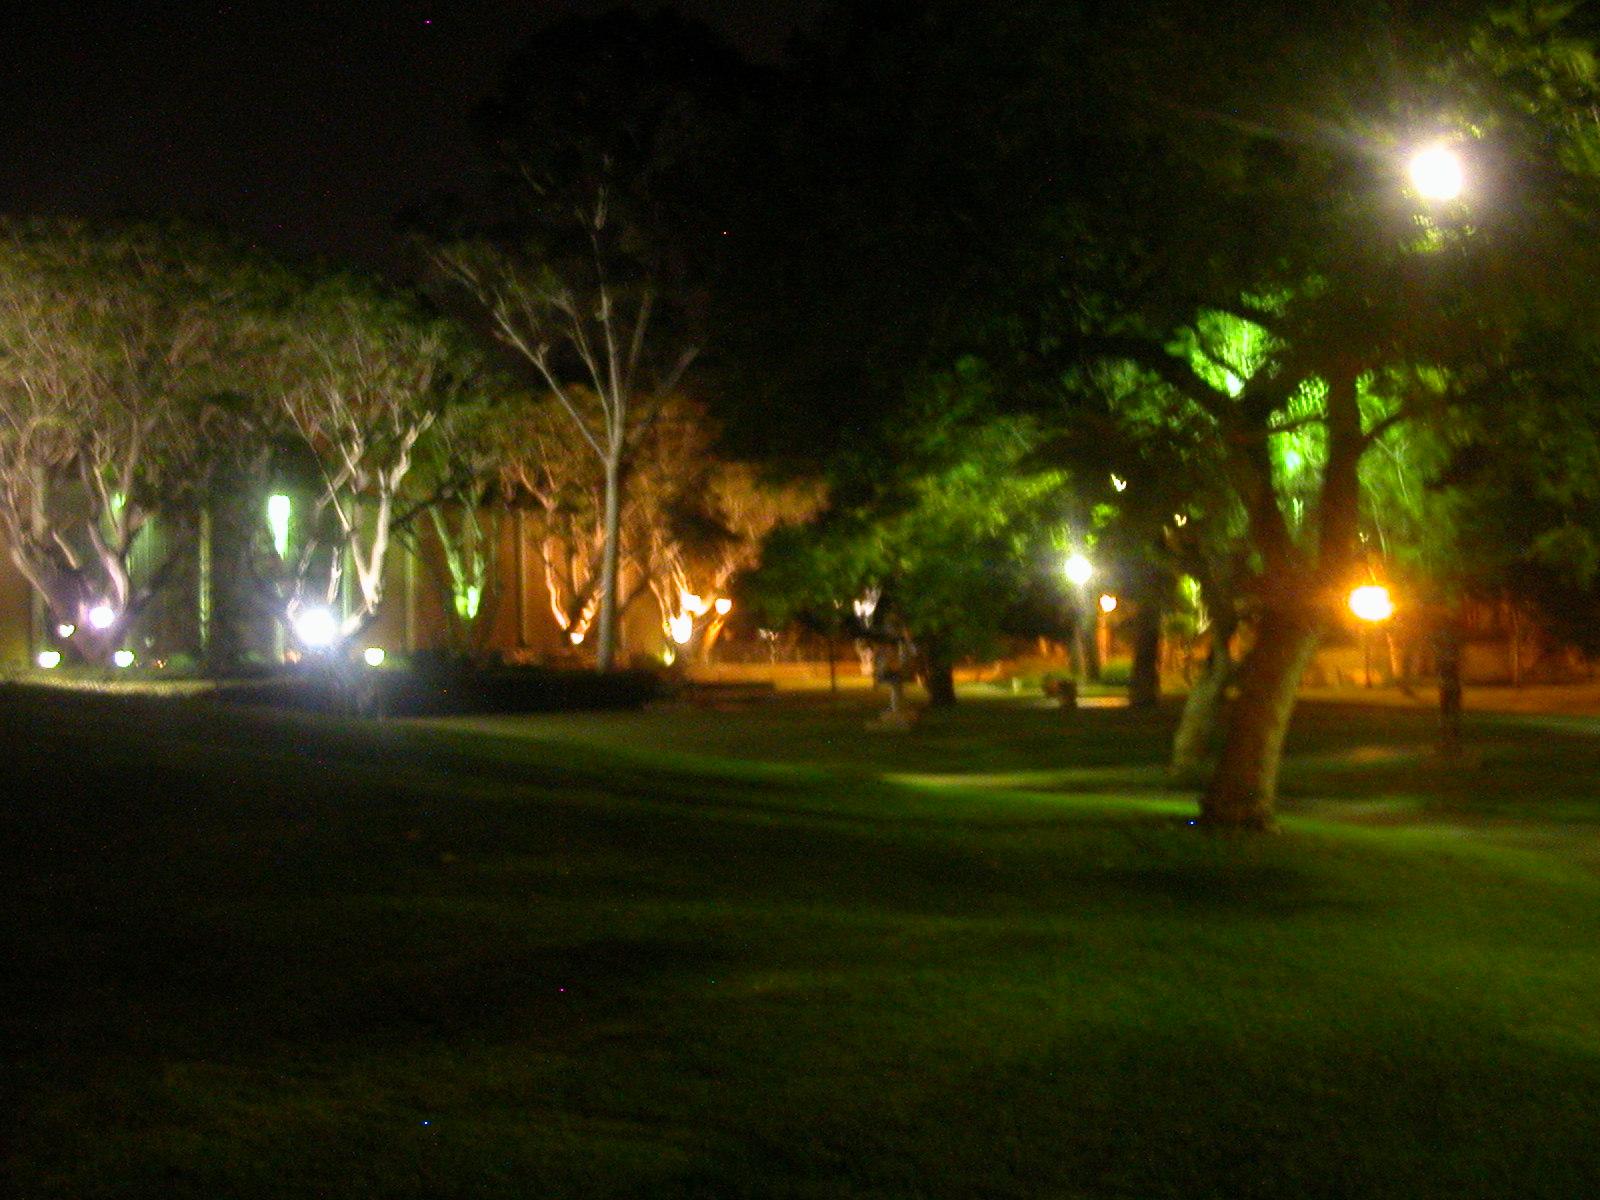 ucla campus at night - photo #44